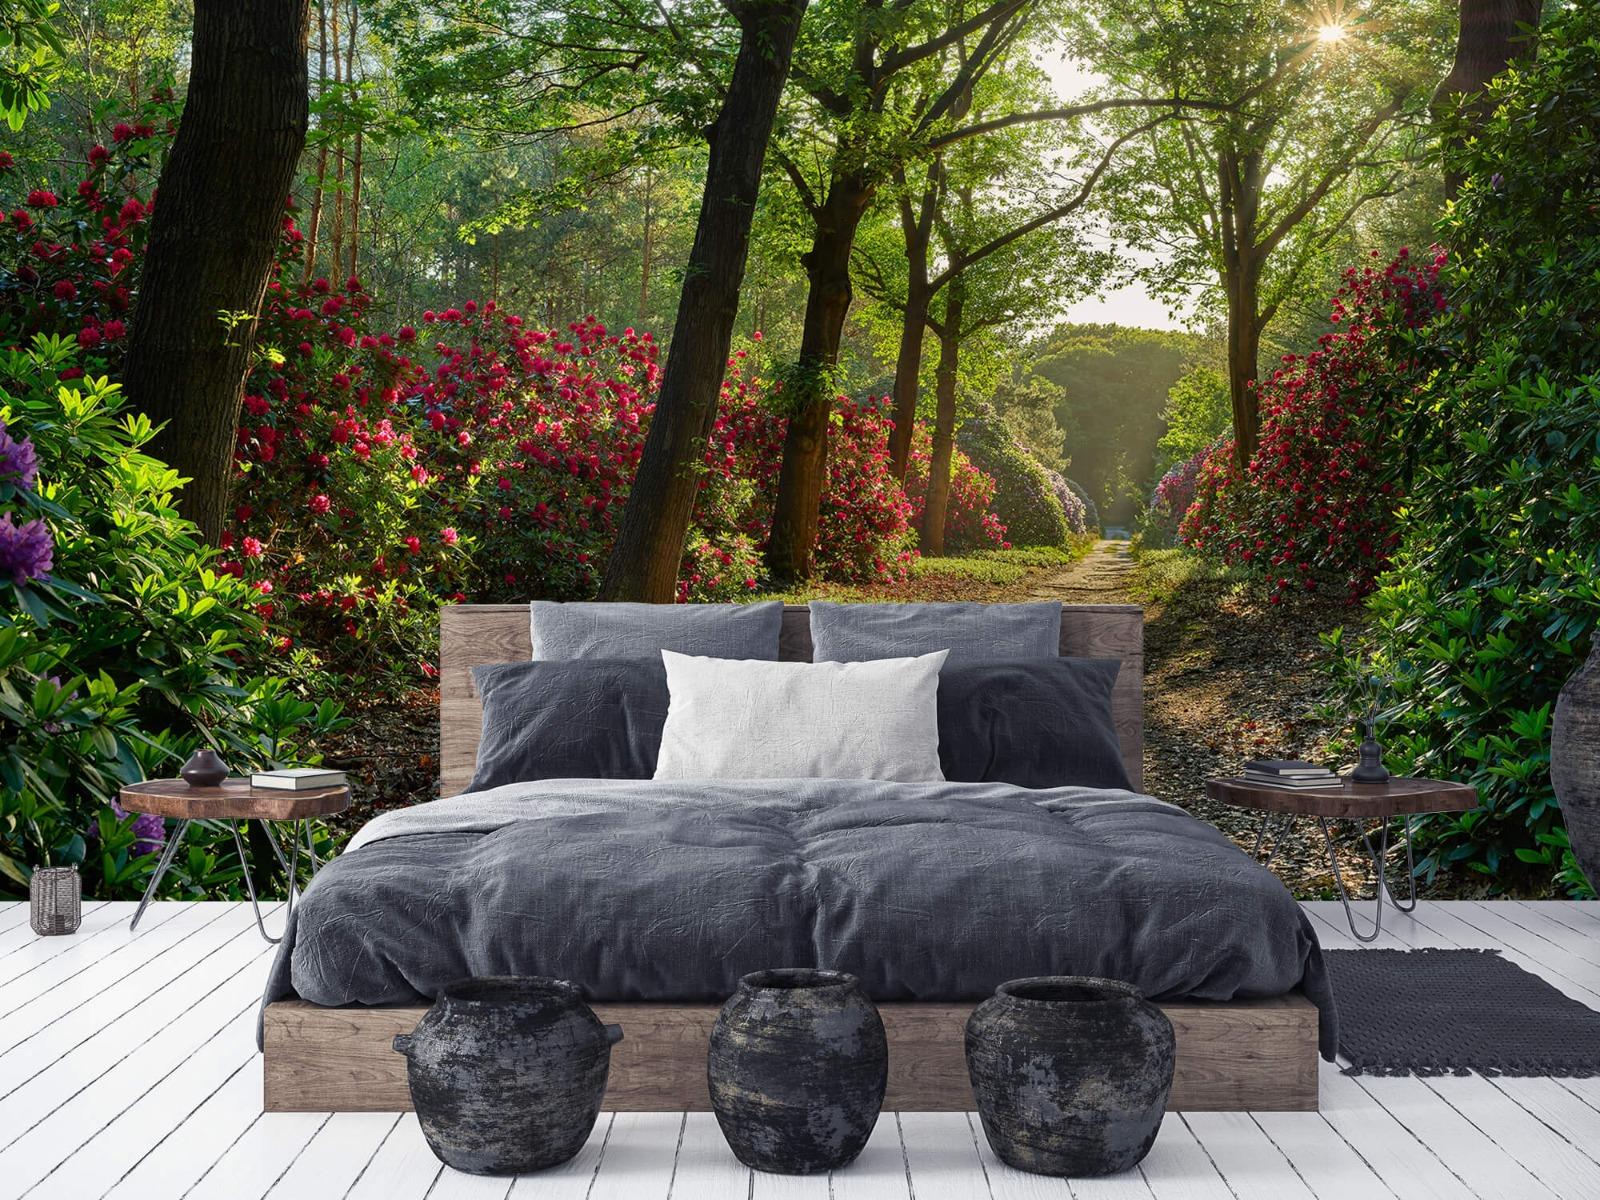 Bos - Zonsopkomst bij pad met rhododendrons 8